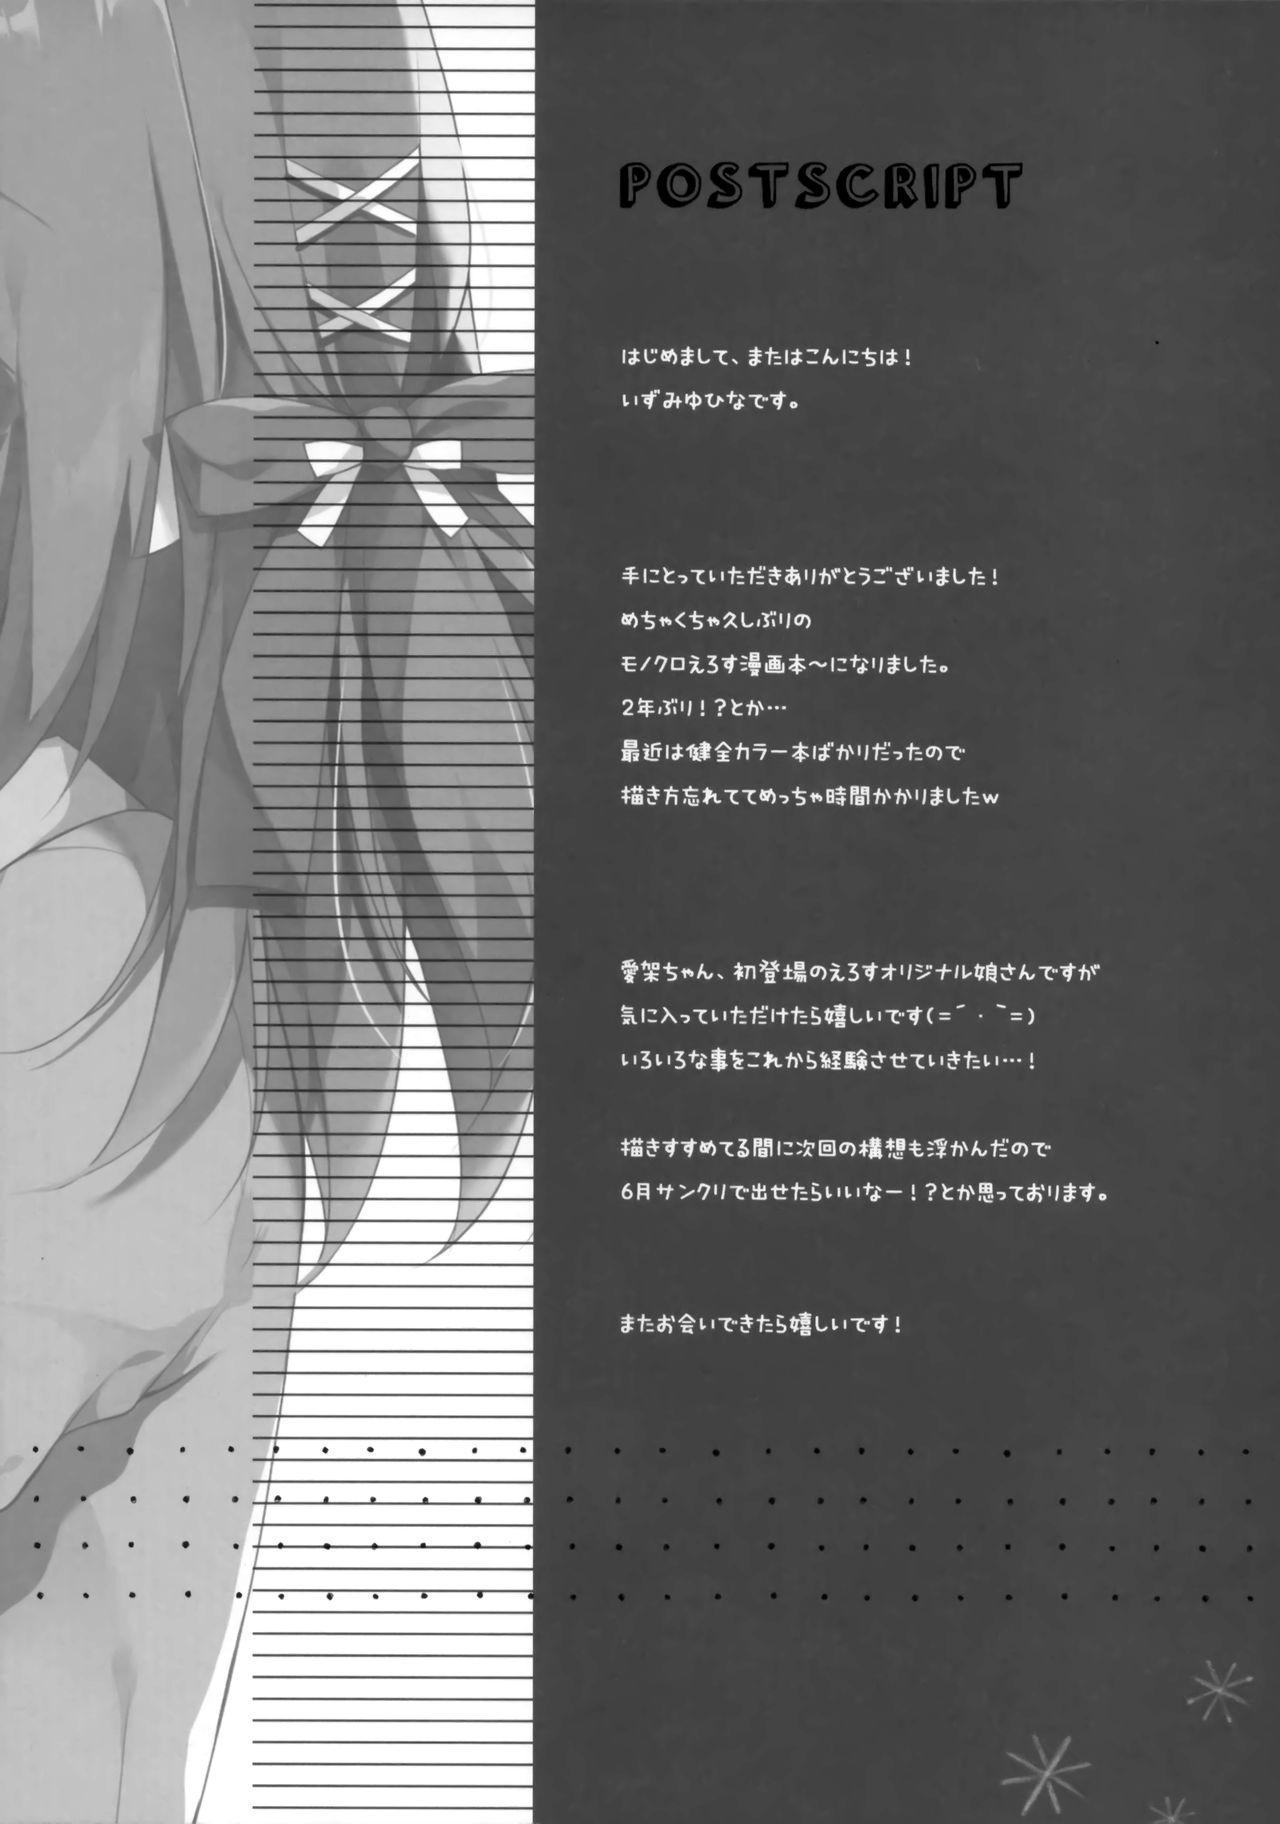 Oshiete! Onii-chan 17